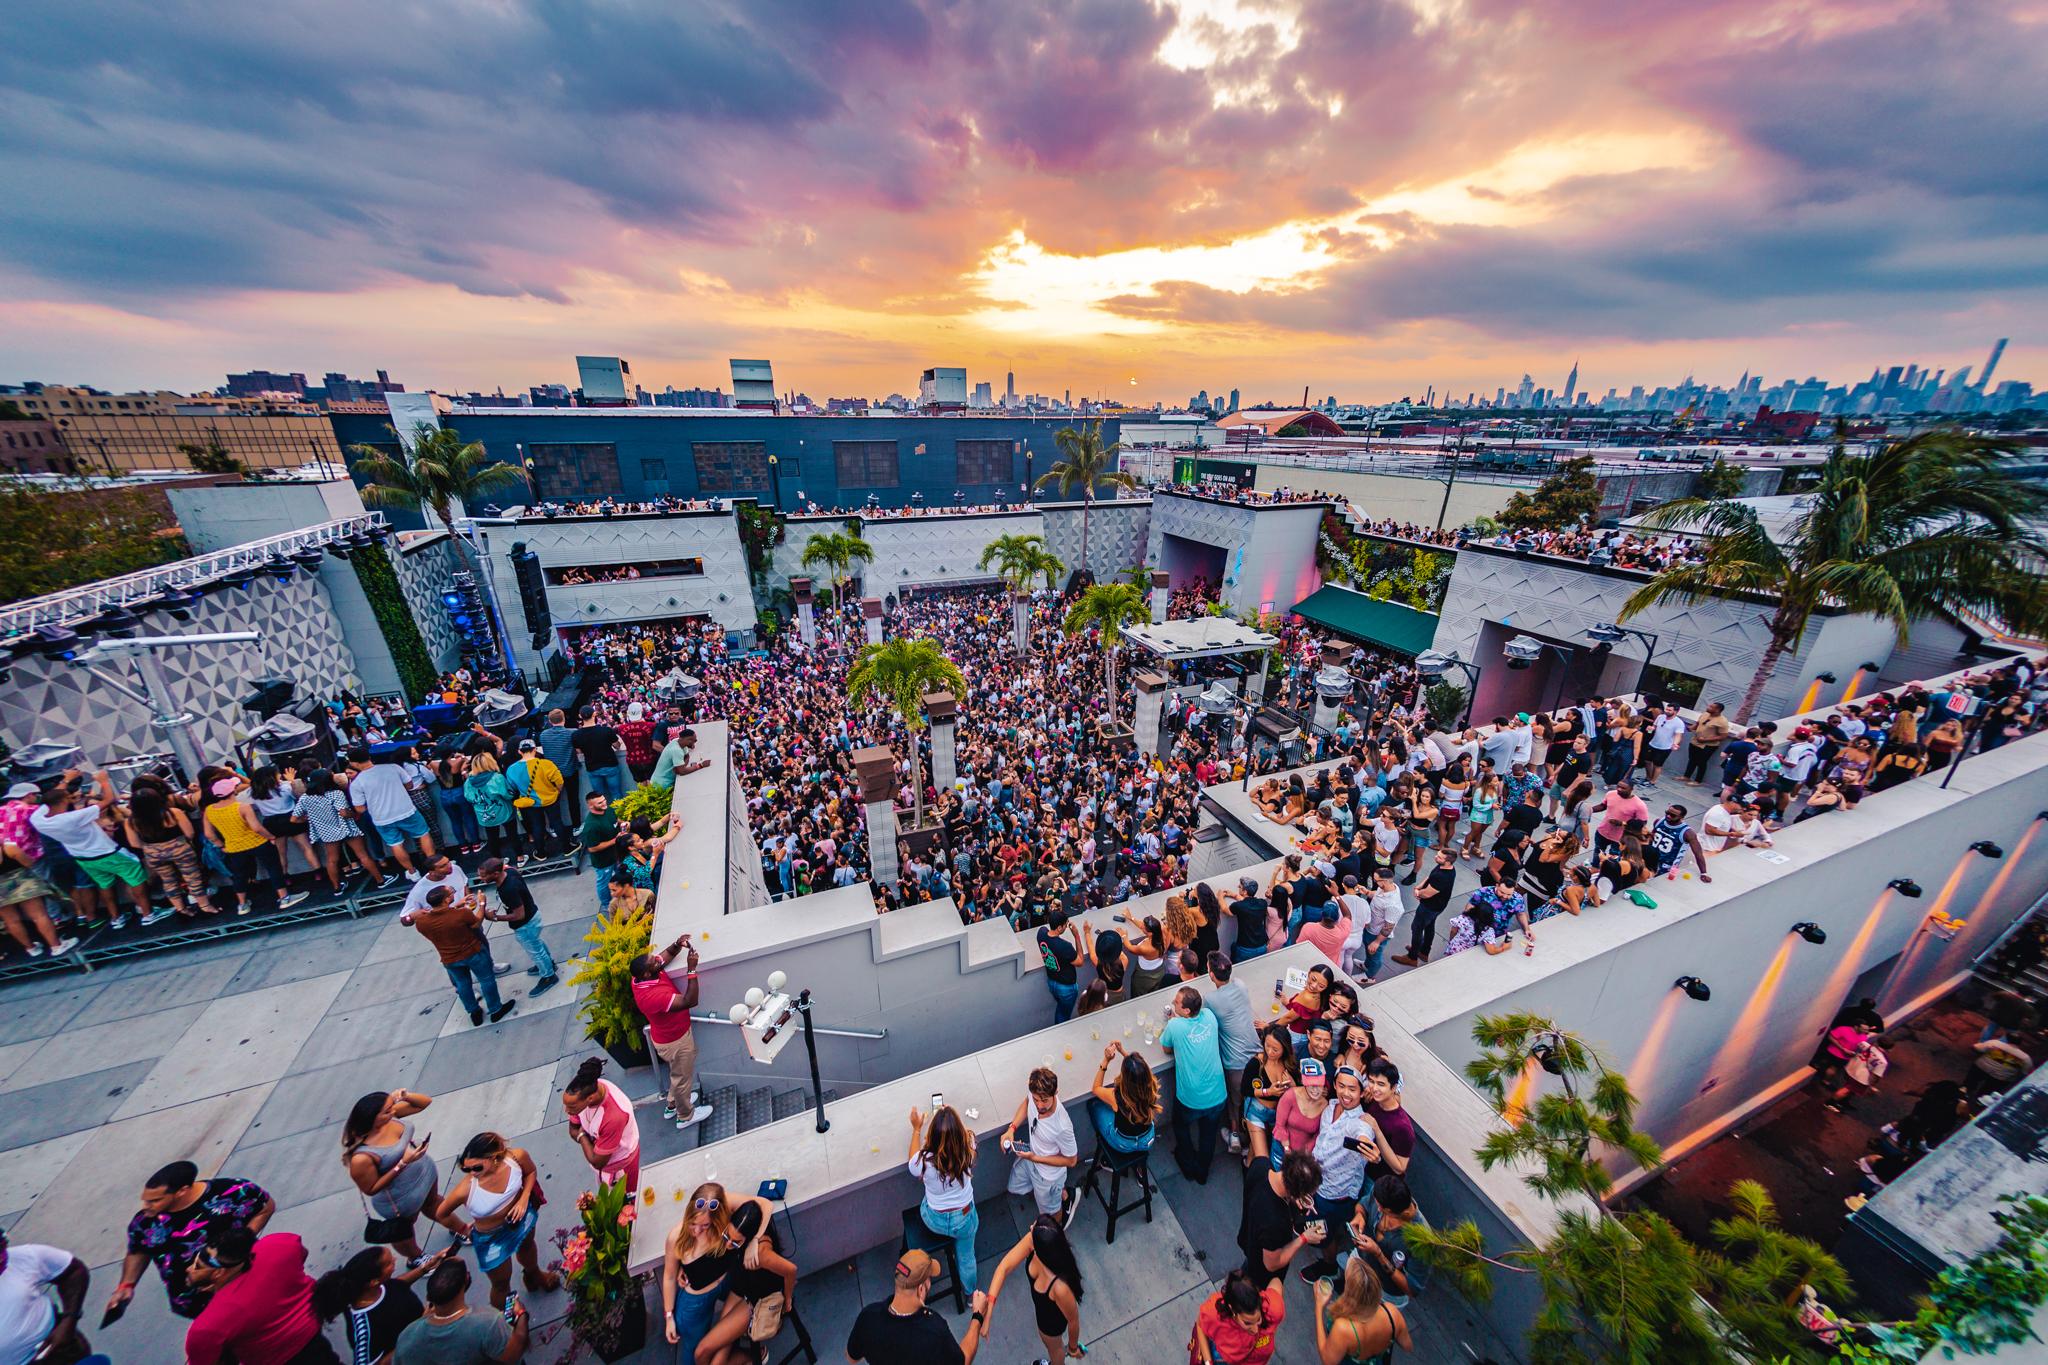 RA: Brooklyn Mirage - New York nightclub